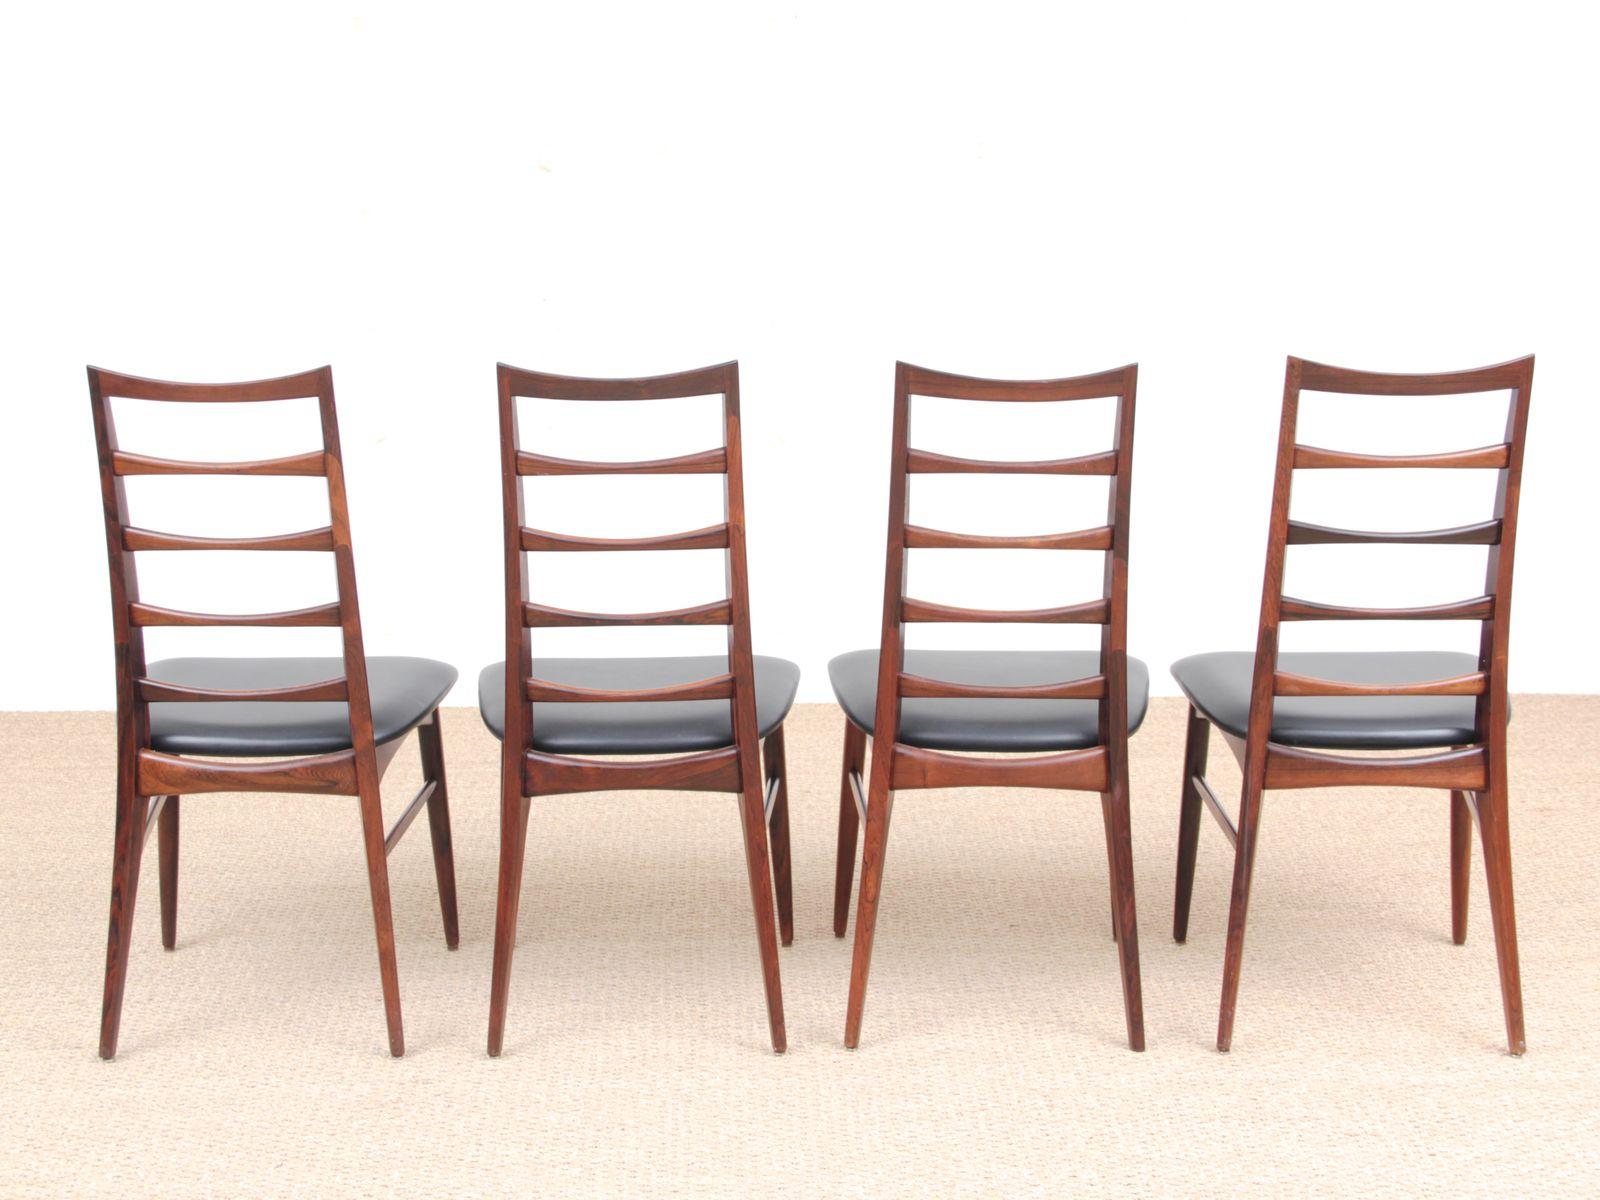 skandinavische palisander lis st hle von niels koefoed 1960er 4er set bei pamono kaufen. Black Bedroom Furniture Sets. Home Design Ideas